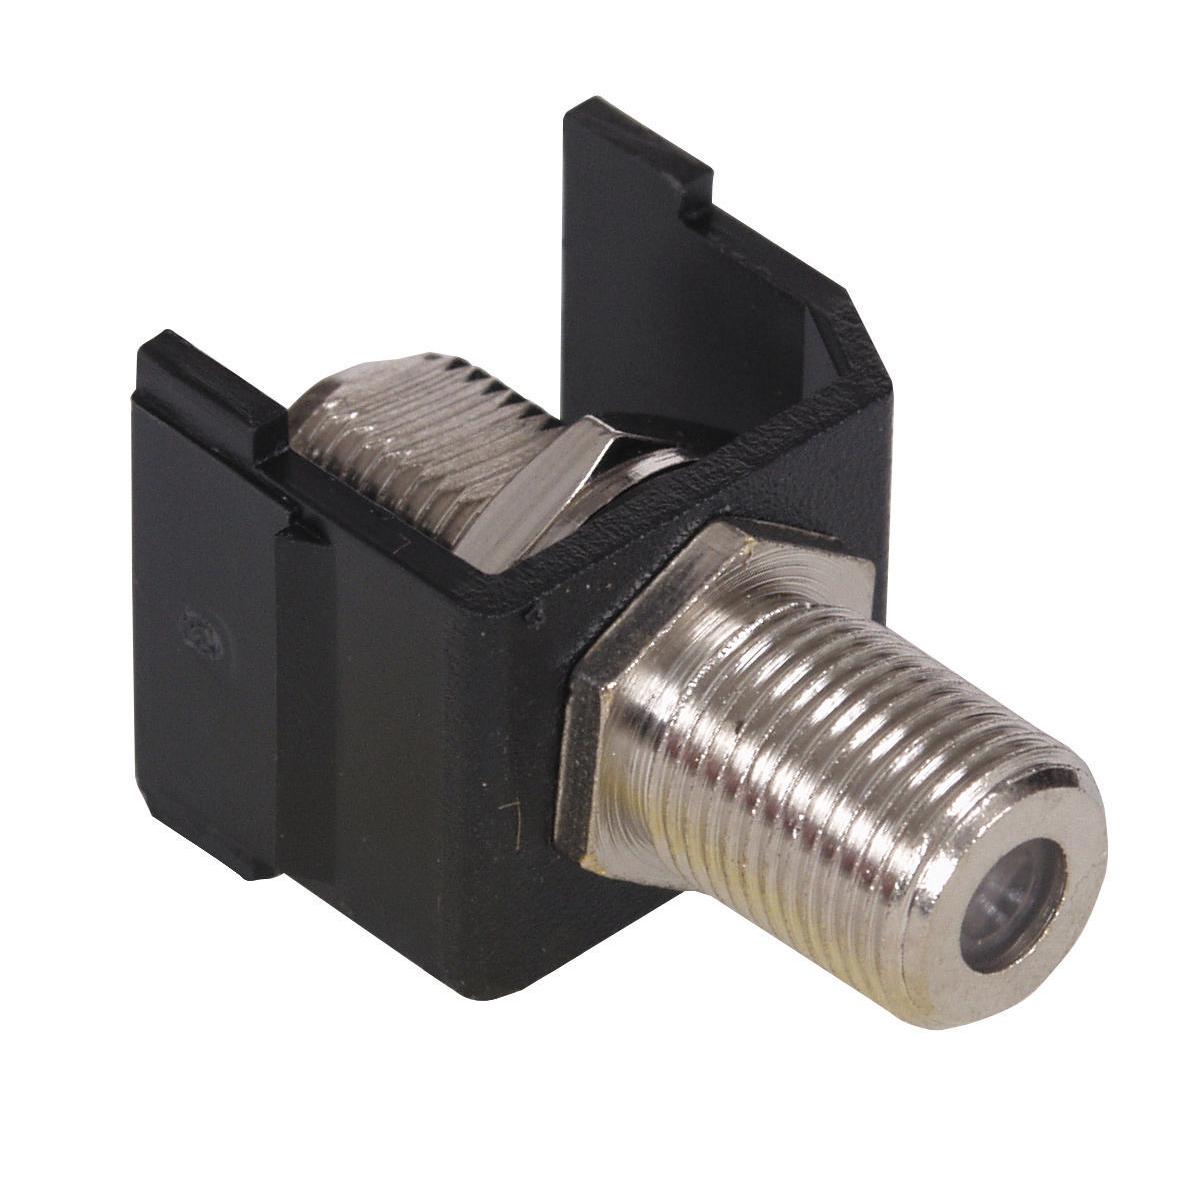 Hubbell SFFBX Black F-Type Audio/Video Keystone Connector